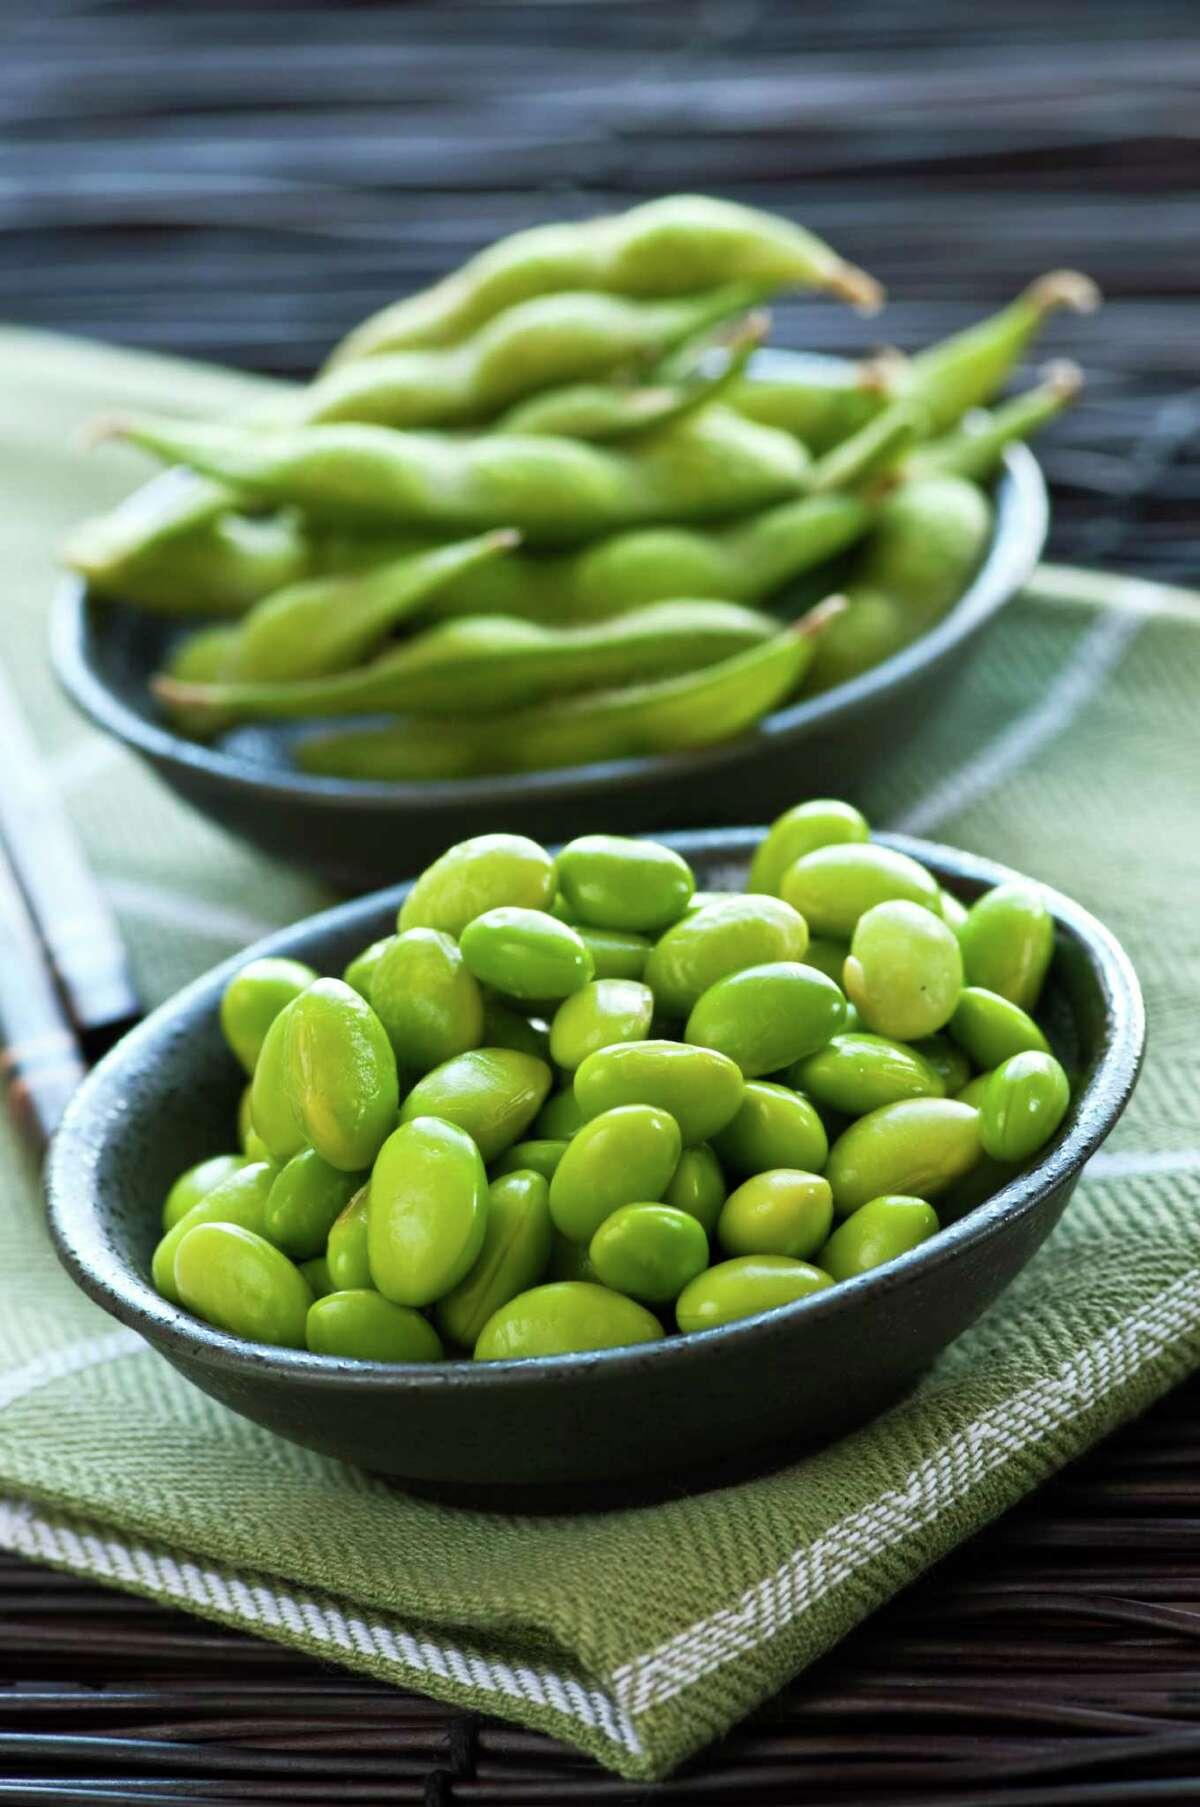 Edamame is full of protein, fiber, iron, phosphorus, magnesium, thiamin, copper, folate, manganese and vitamin K.